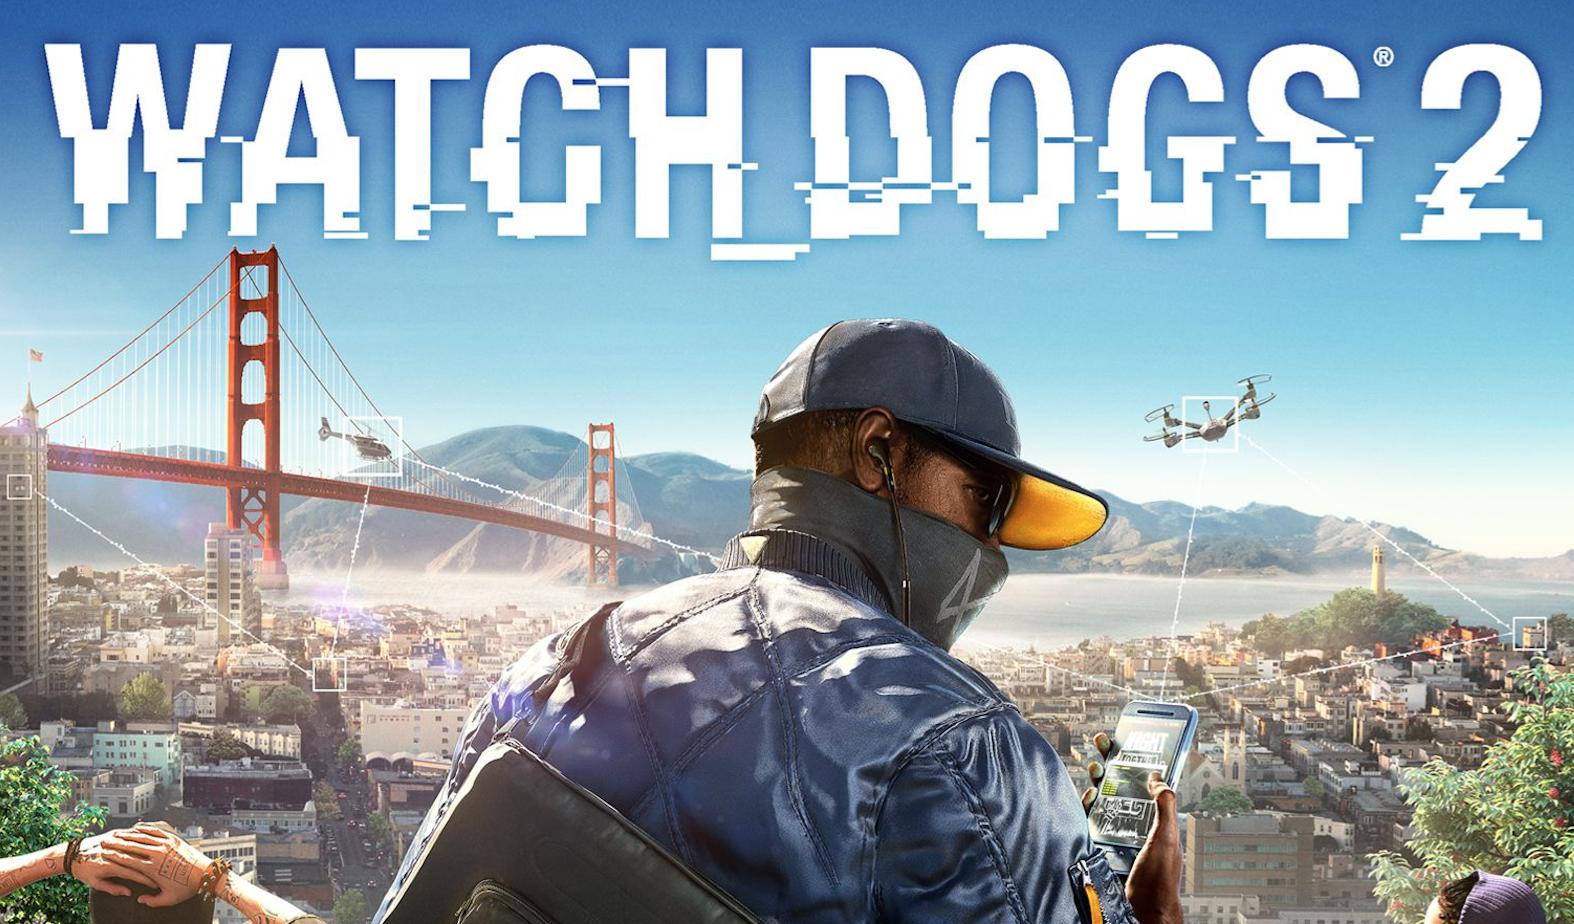 watch-dogs-2-ubisoft-release-wallpaper-logo-nat-games-2